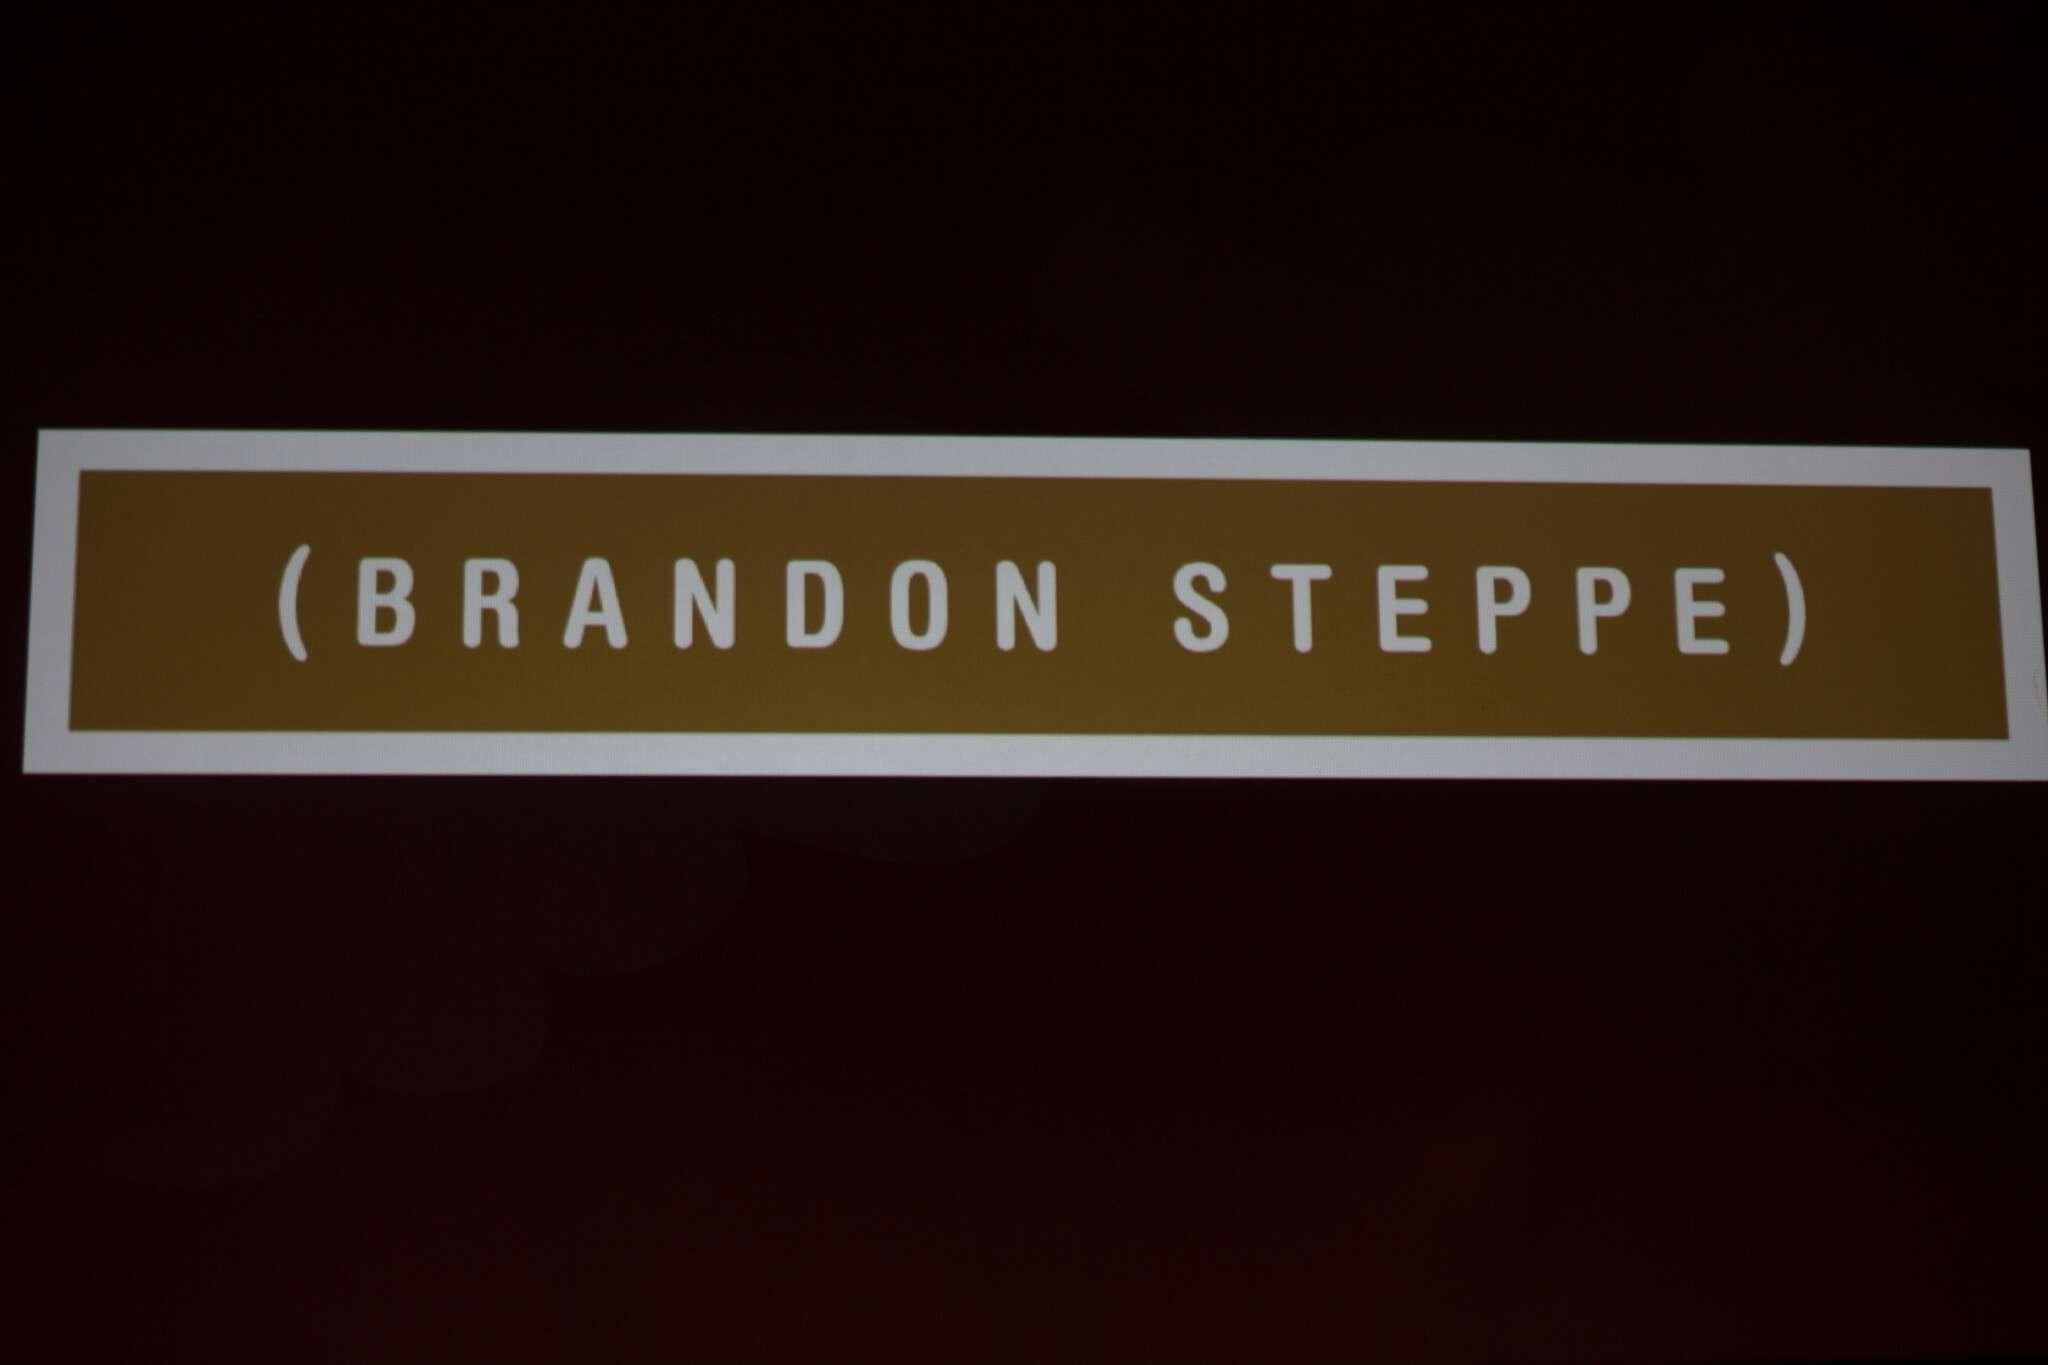 Brandon Steppe